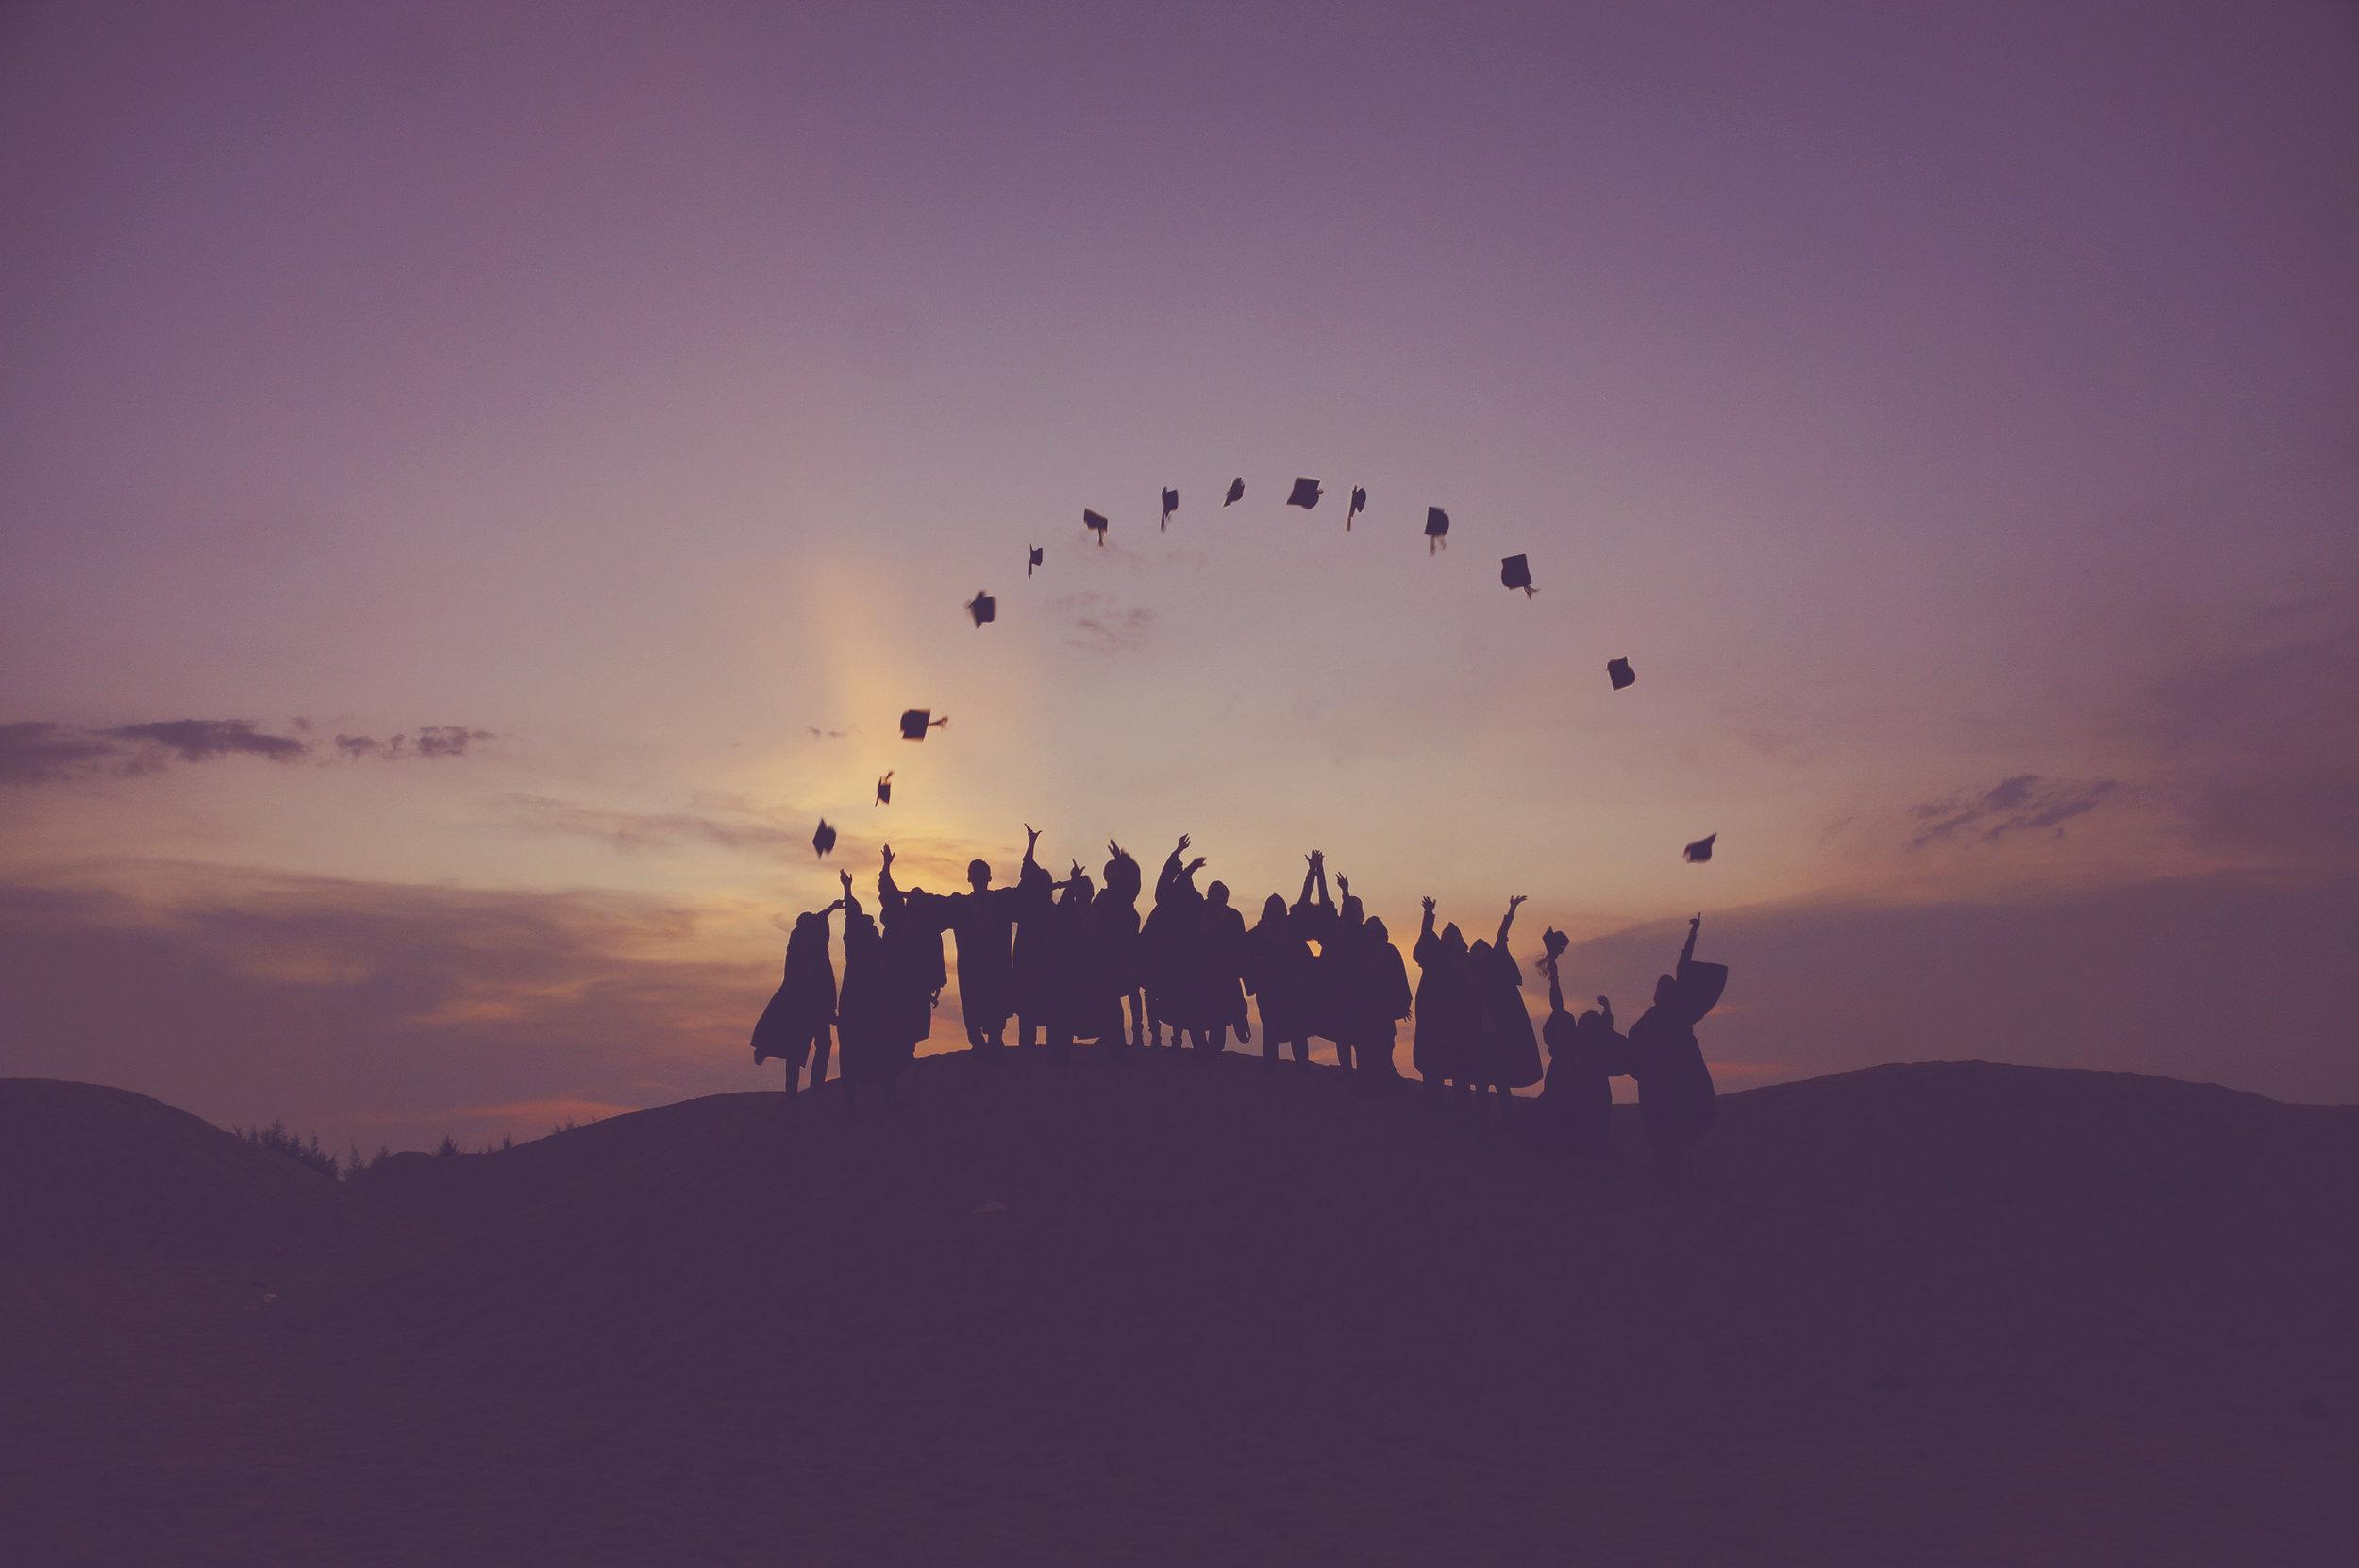 dawn-sunset-people-graduation-sunrise-94356.jpeg